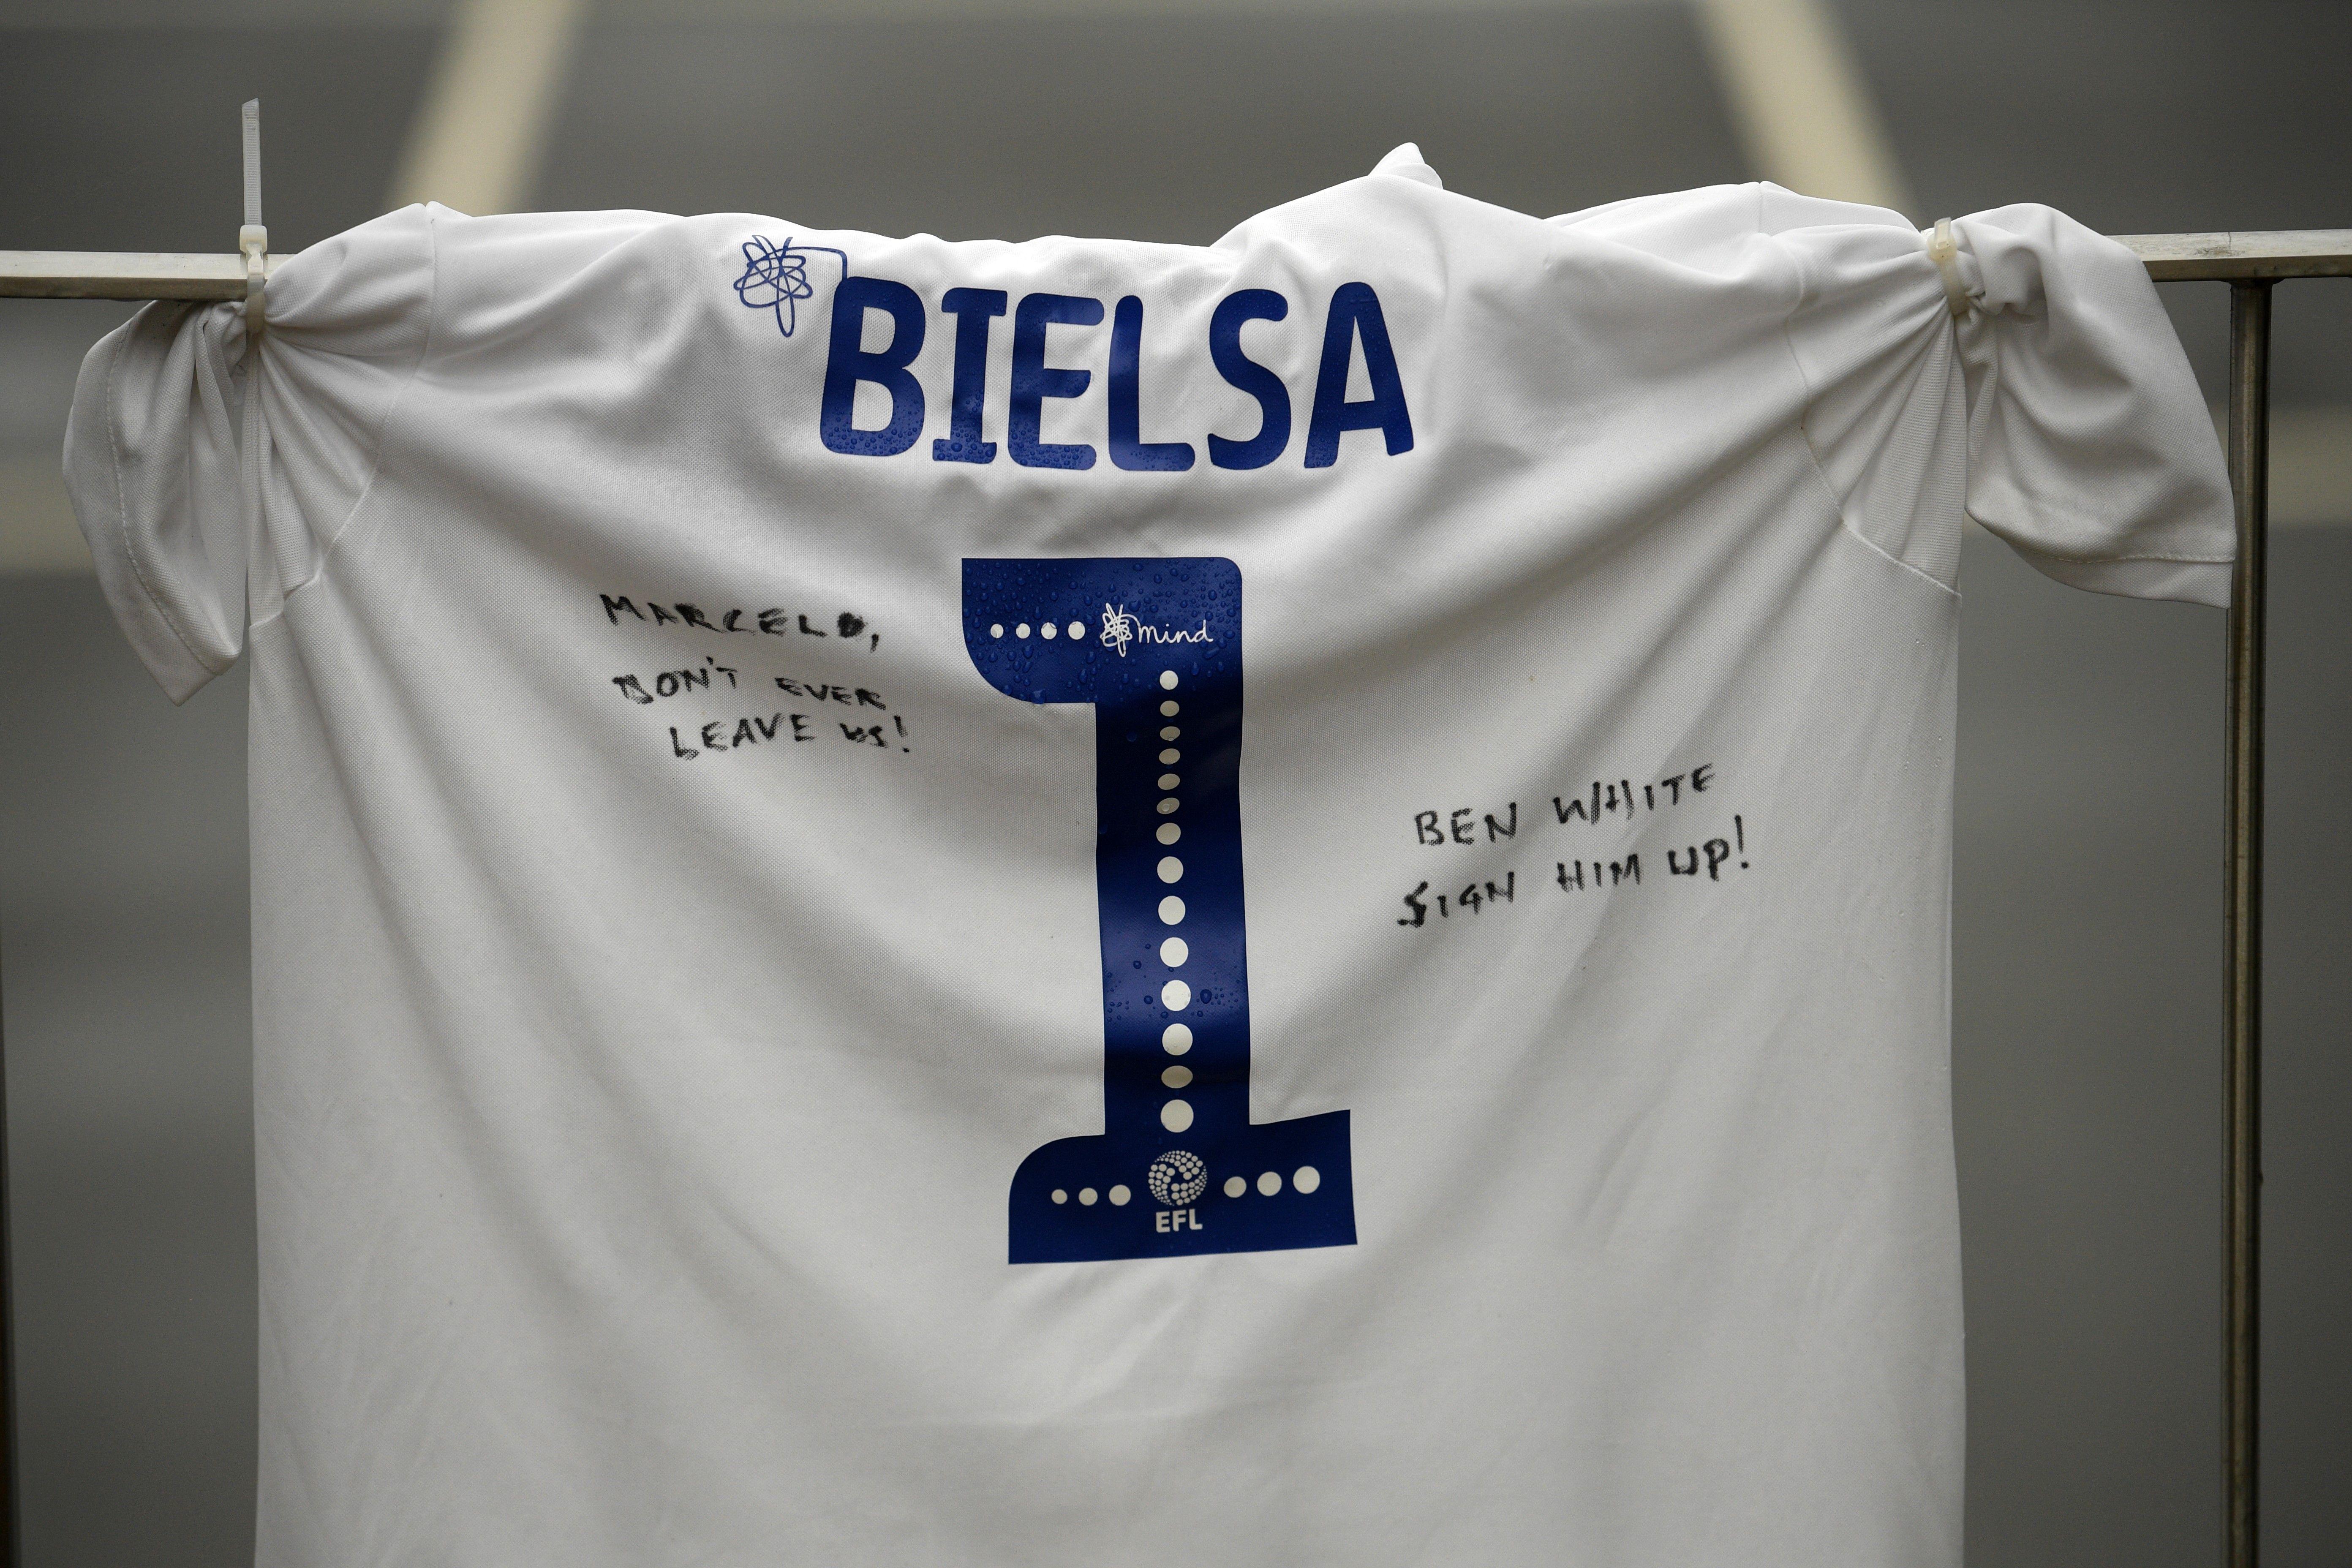 Leeds United football shirt, with the name of Argentinian head coach Marcelo Bielsa - Premier League